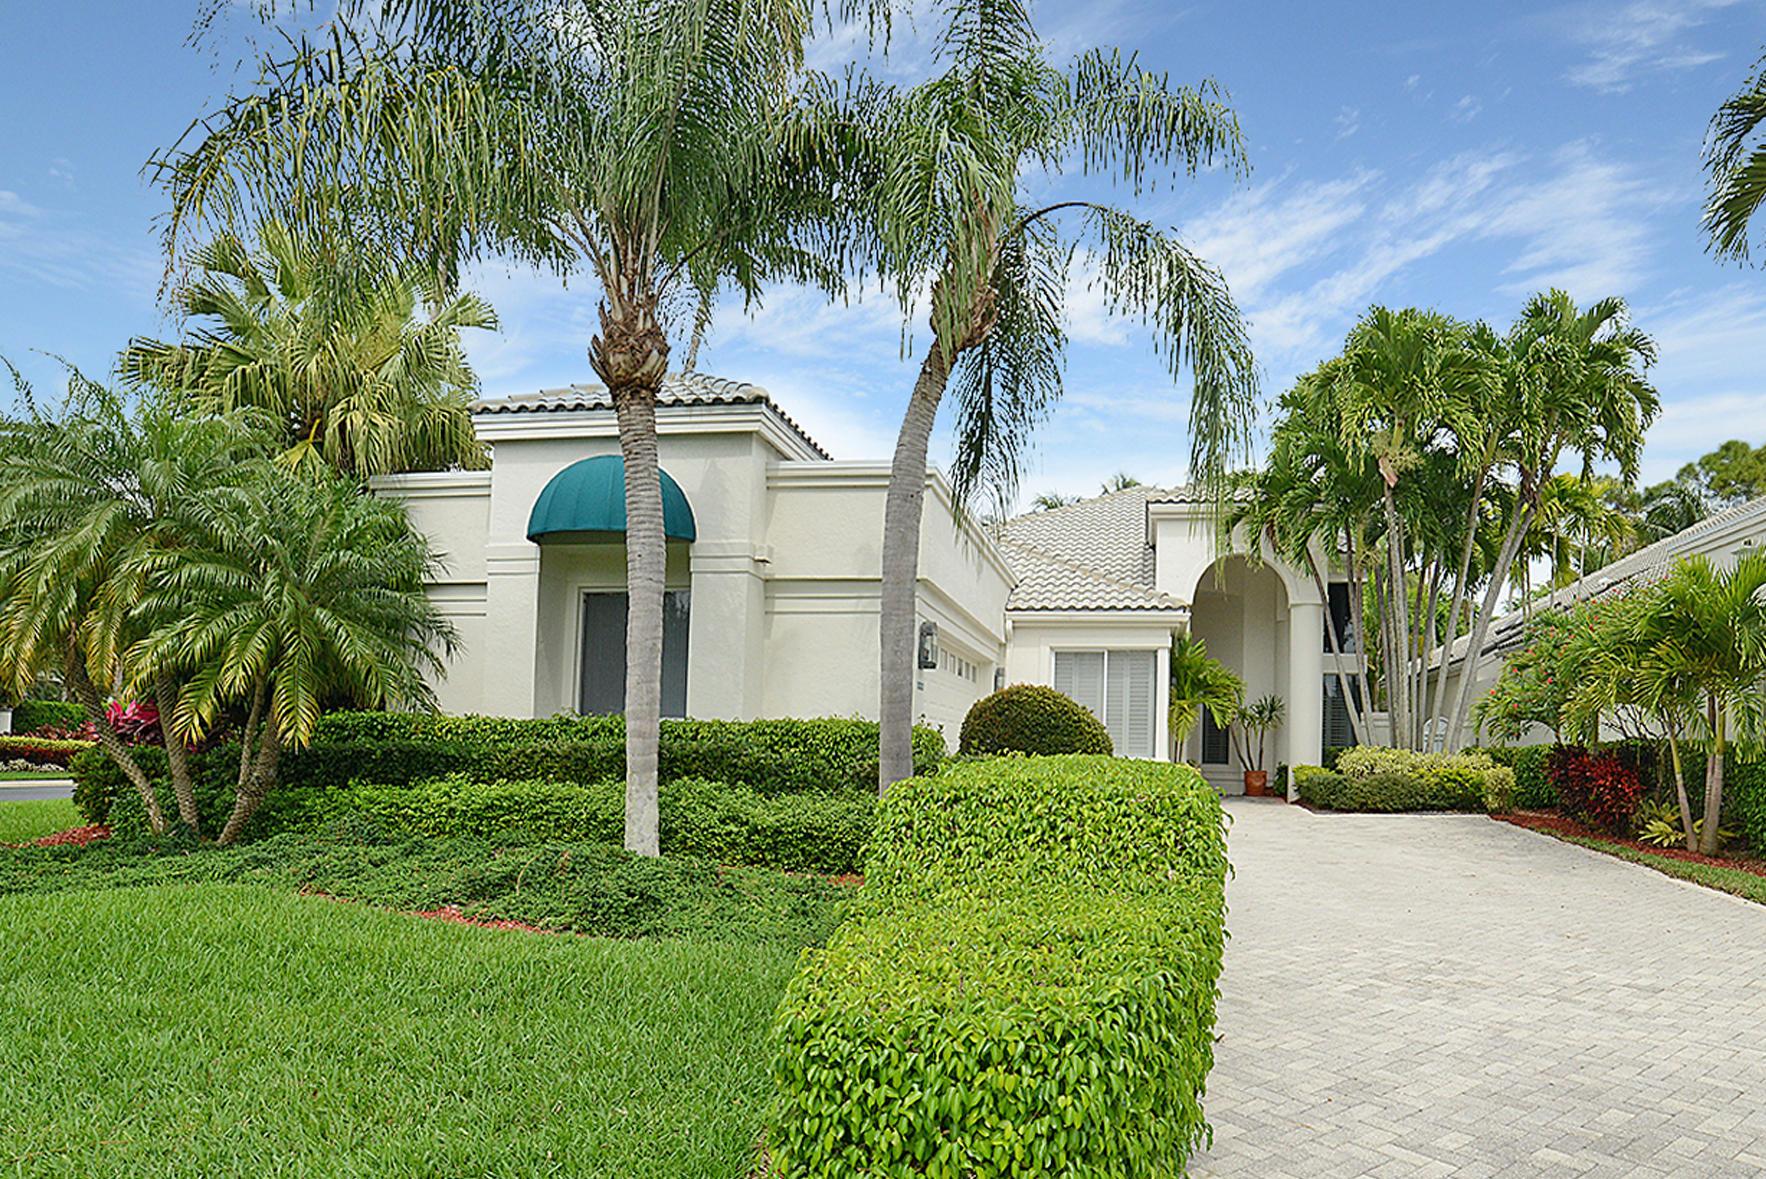 Photo of 6098 NW 24th Terrace, Boca Raton, FL 33496